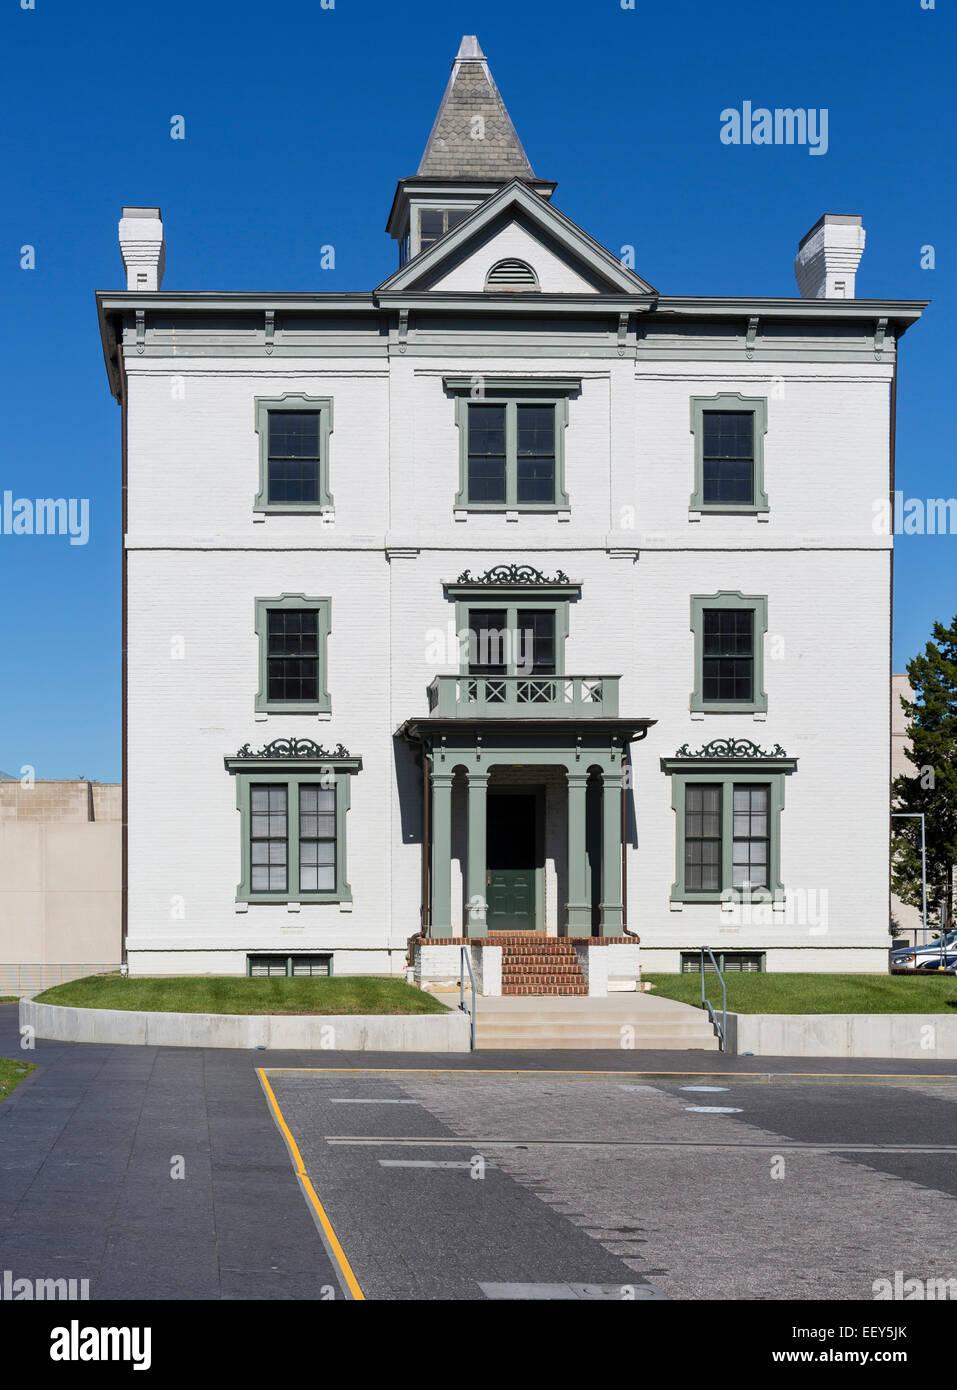 Virginia Historical Society Gebäude am Virginia Museum of Fine Arts VMFA in Richmond, Virginia, USA Stockbild